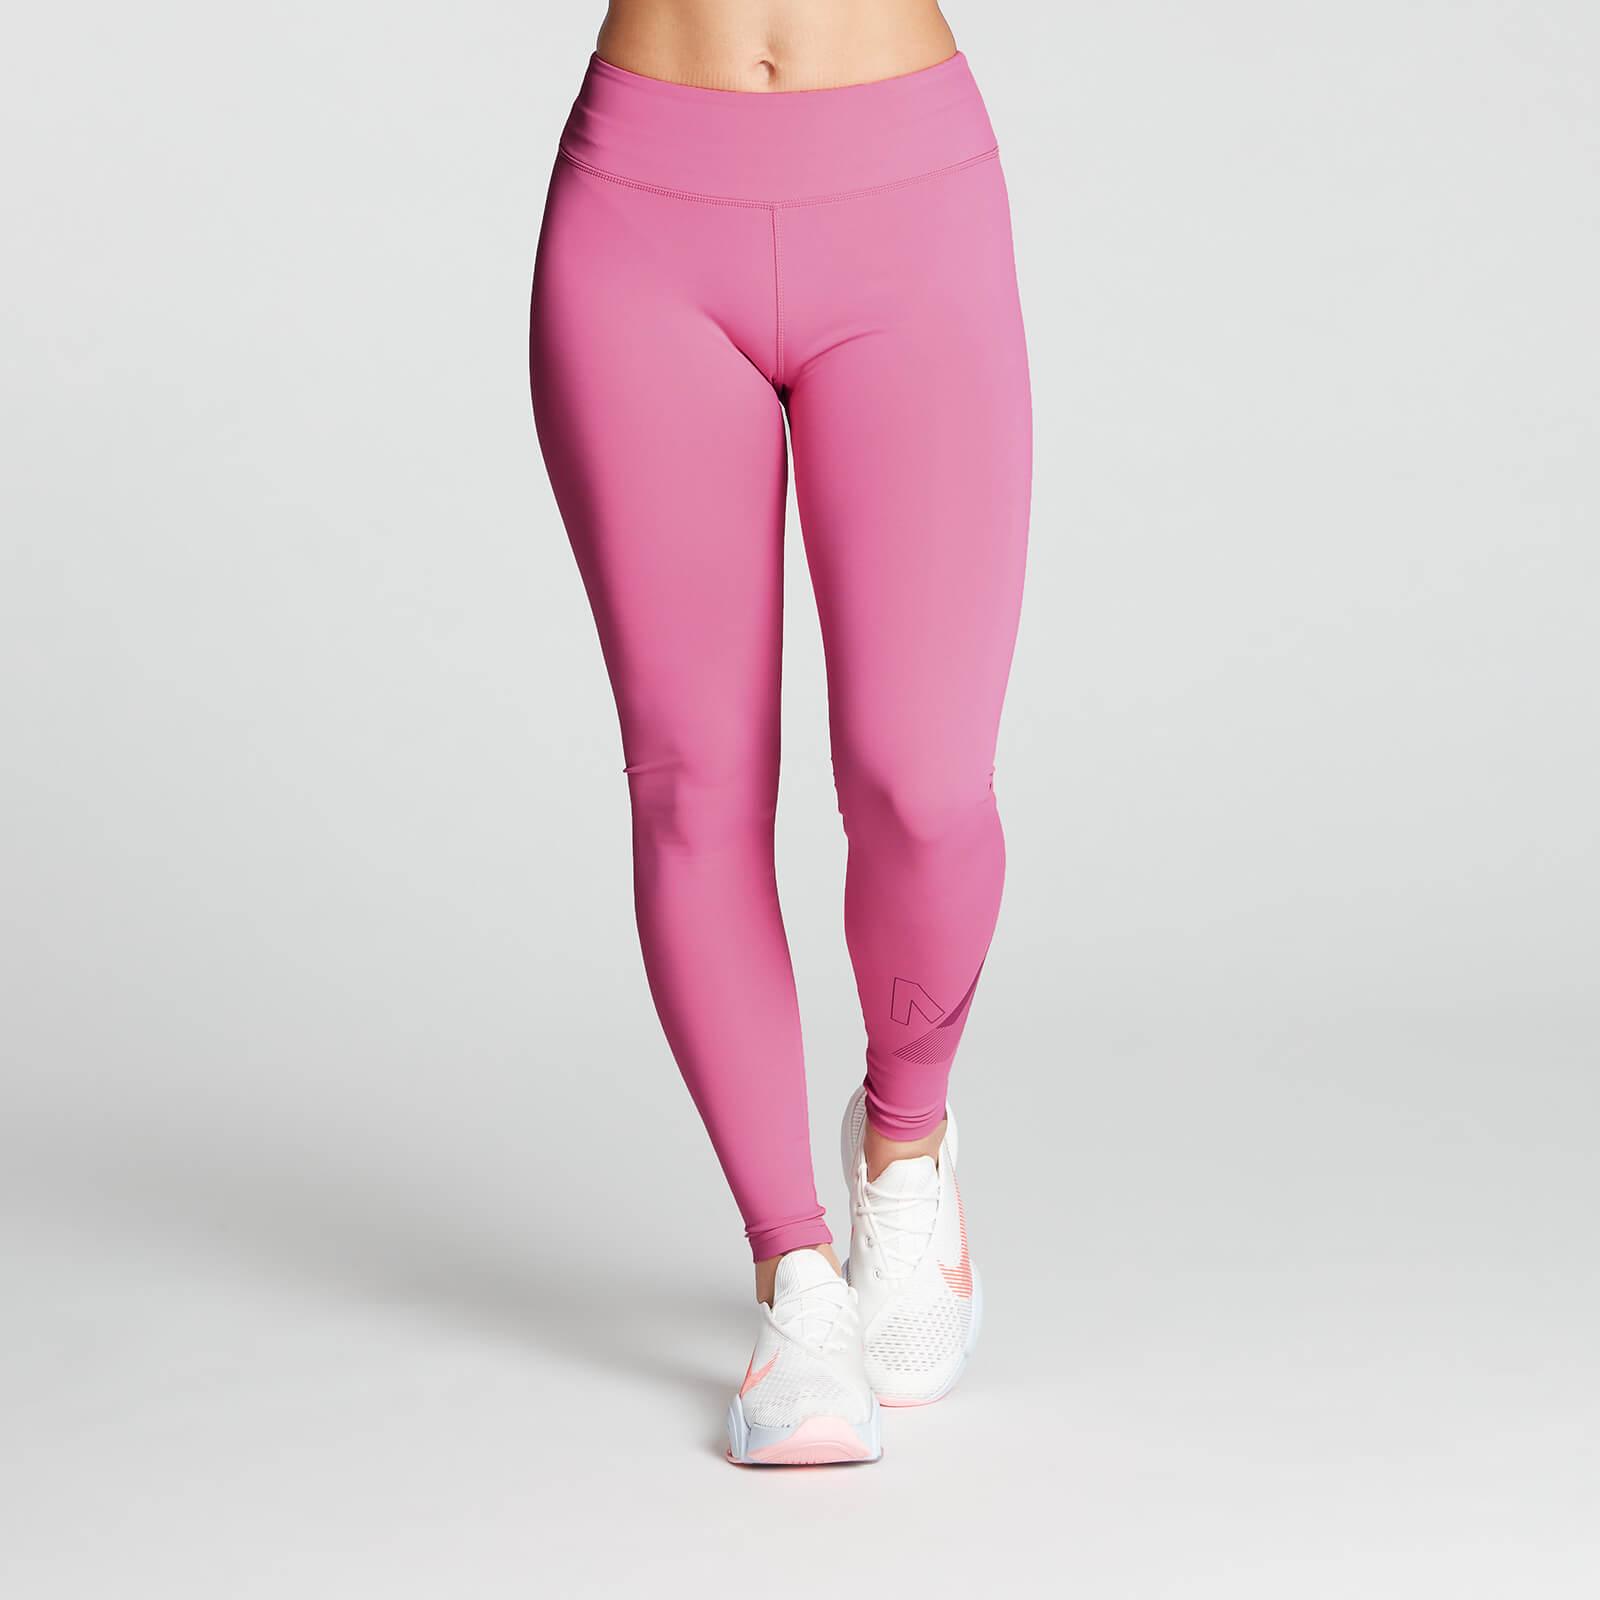 MP Women's Limited Edition Impact Leggings - Pink - XXL, Myprotein International  - купить со скидкой